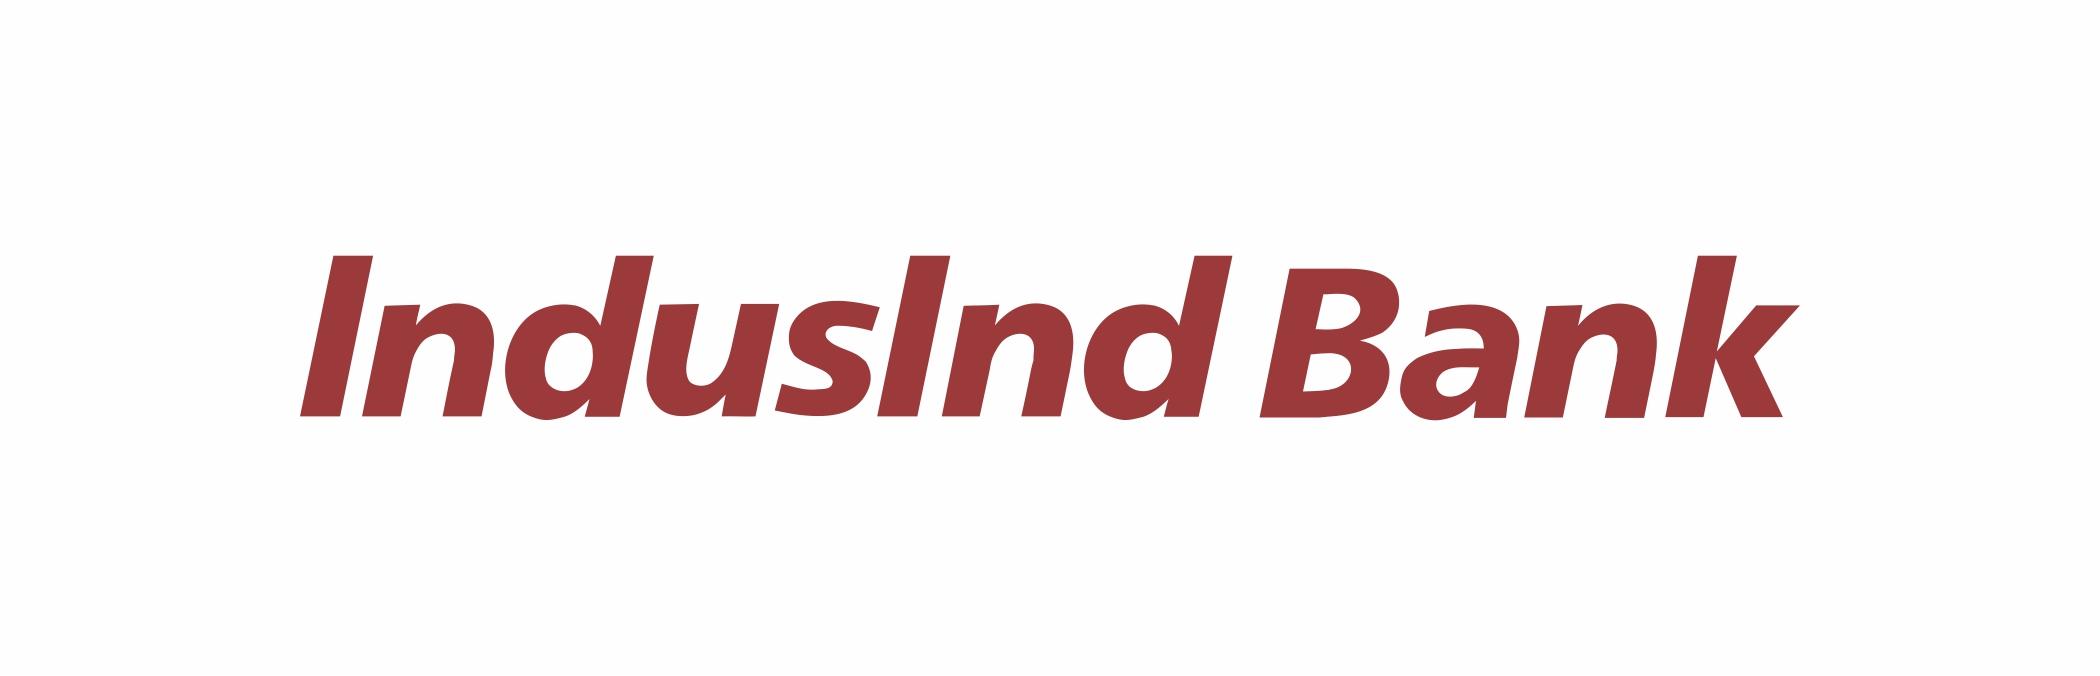 IndusInd Bank,BORINGROAD - logo